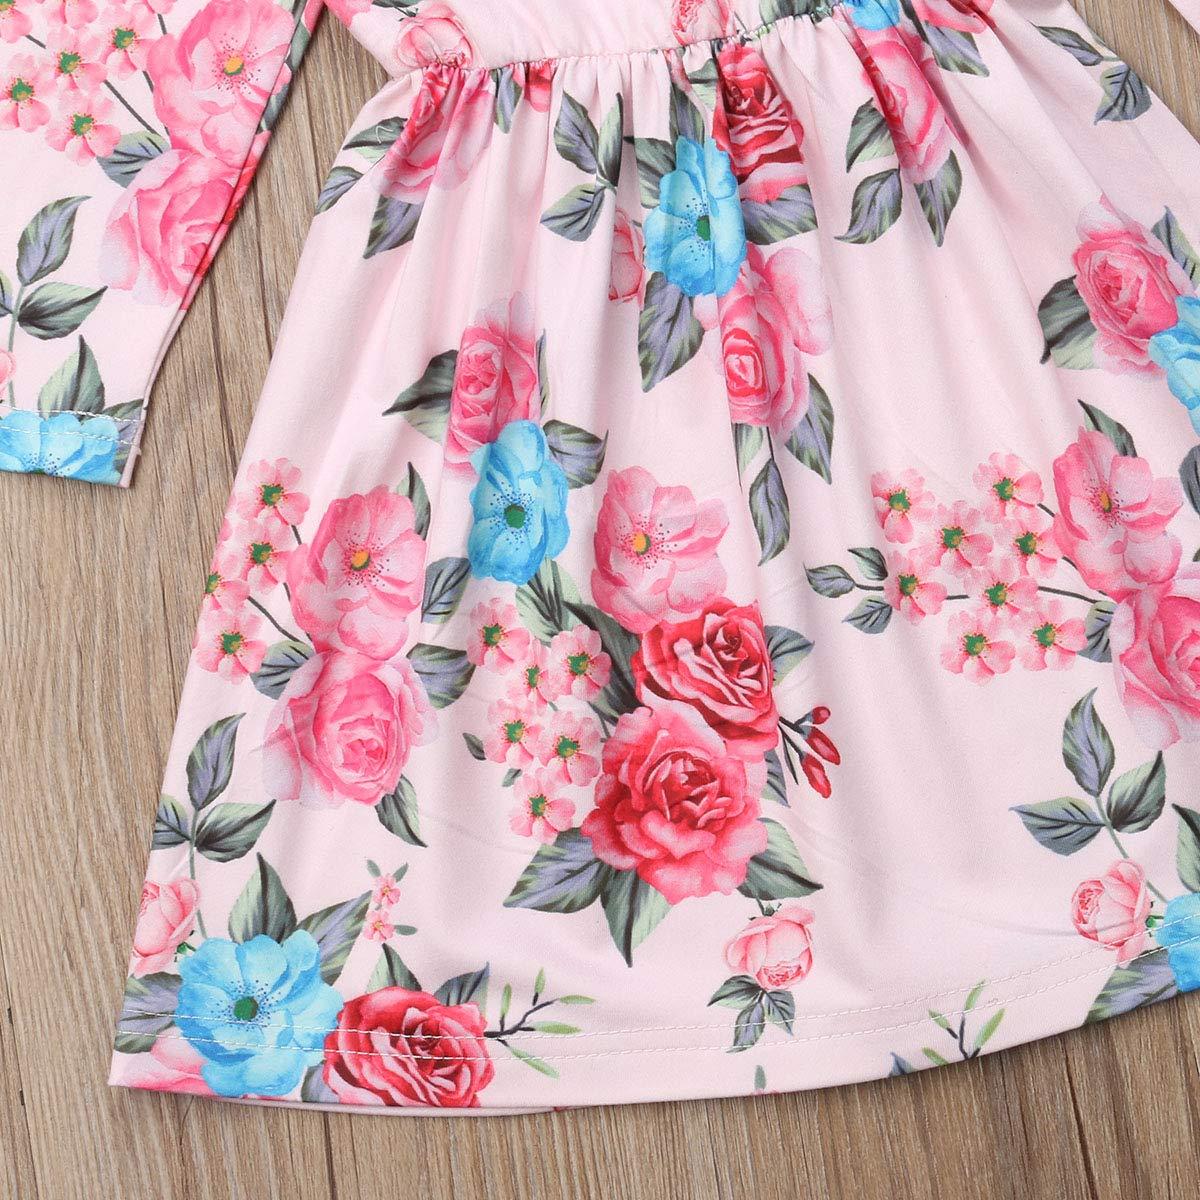 Cheeulish Toddler Baby Girl Infant Kids Fall Winter Flower Ruffle Long Sleeve Casual Dress